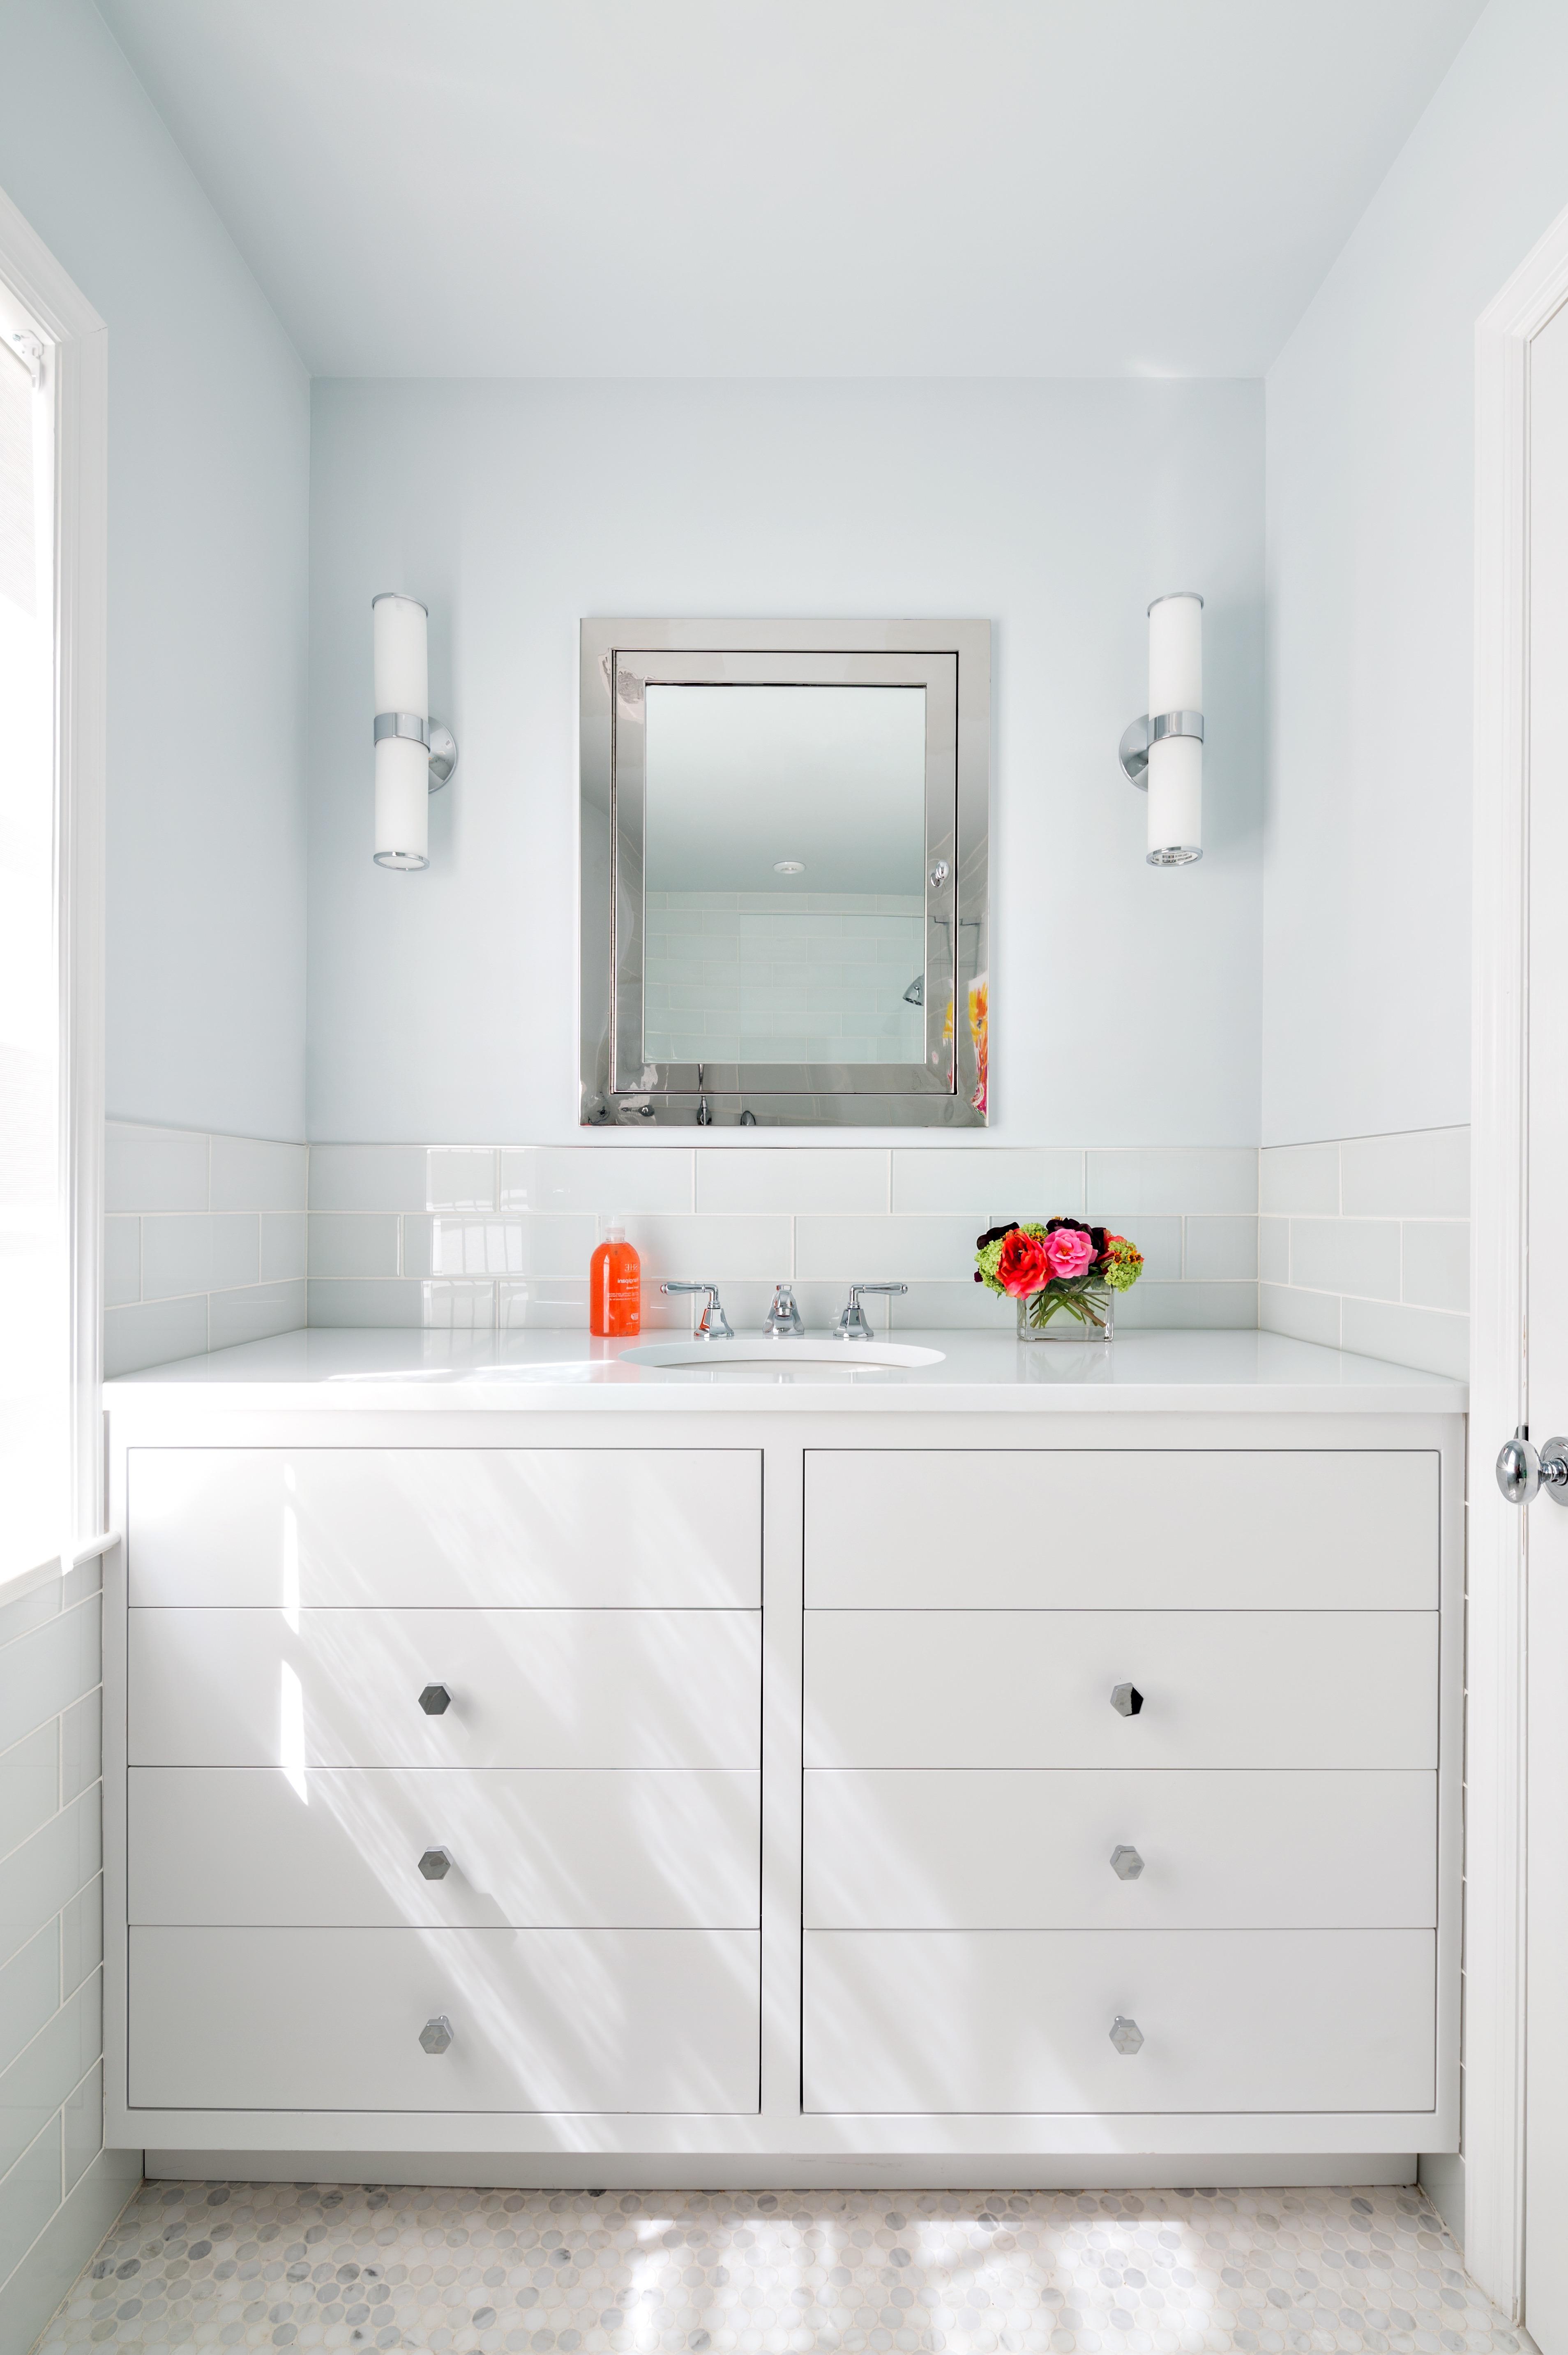 Minimalist White Flat Panel Bathroom Vanity Storage Cabinets (View 2 of 20)